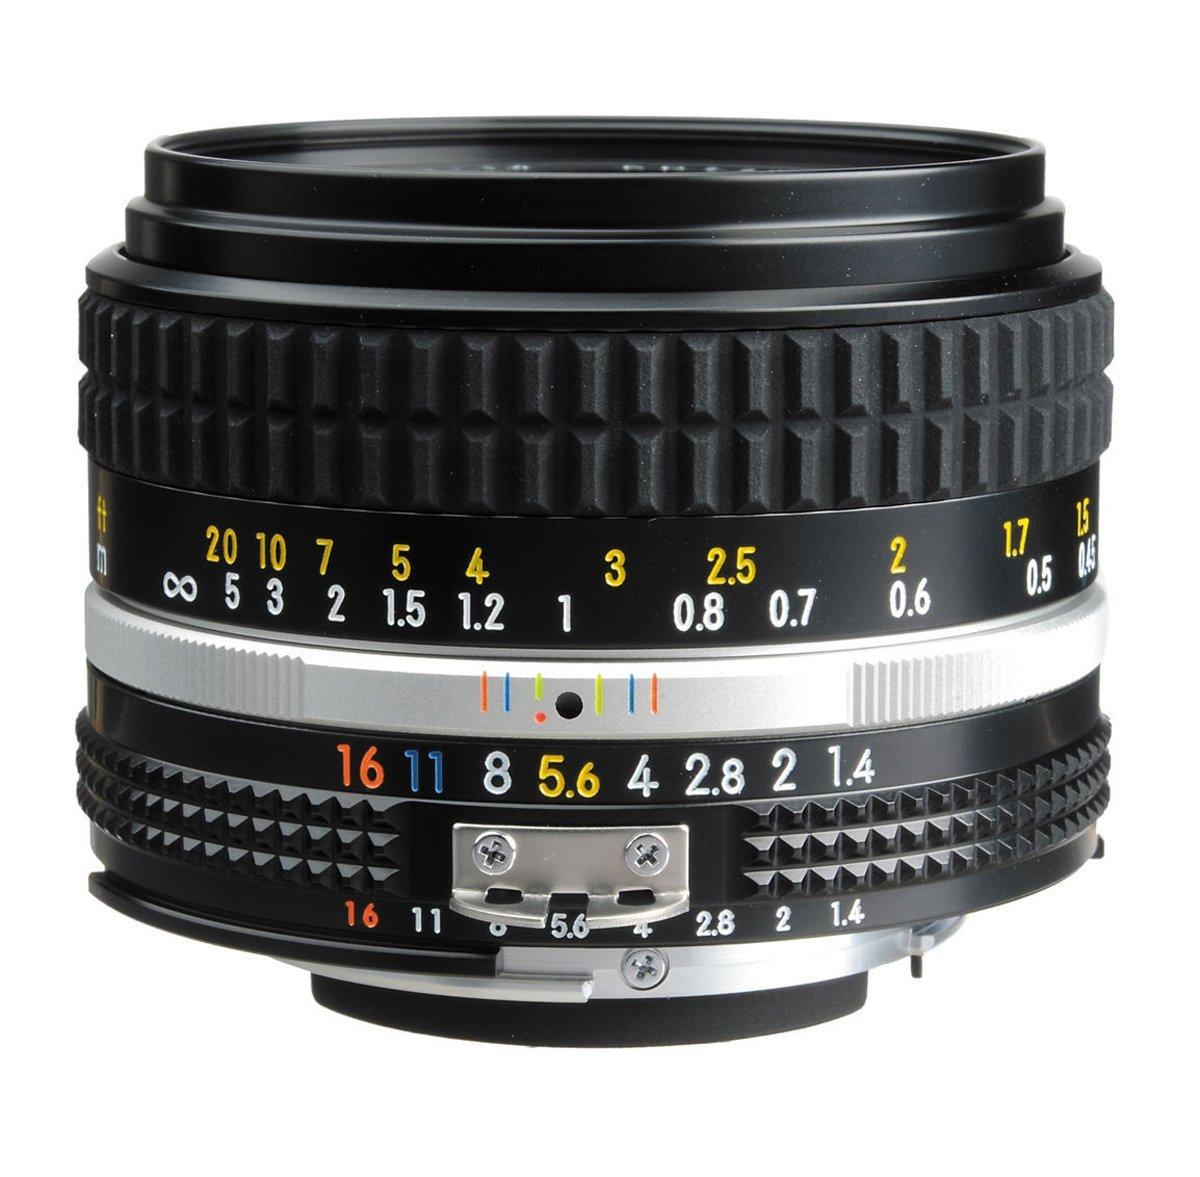 Nikon 50mm 1.4 Lens